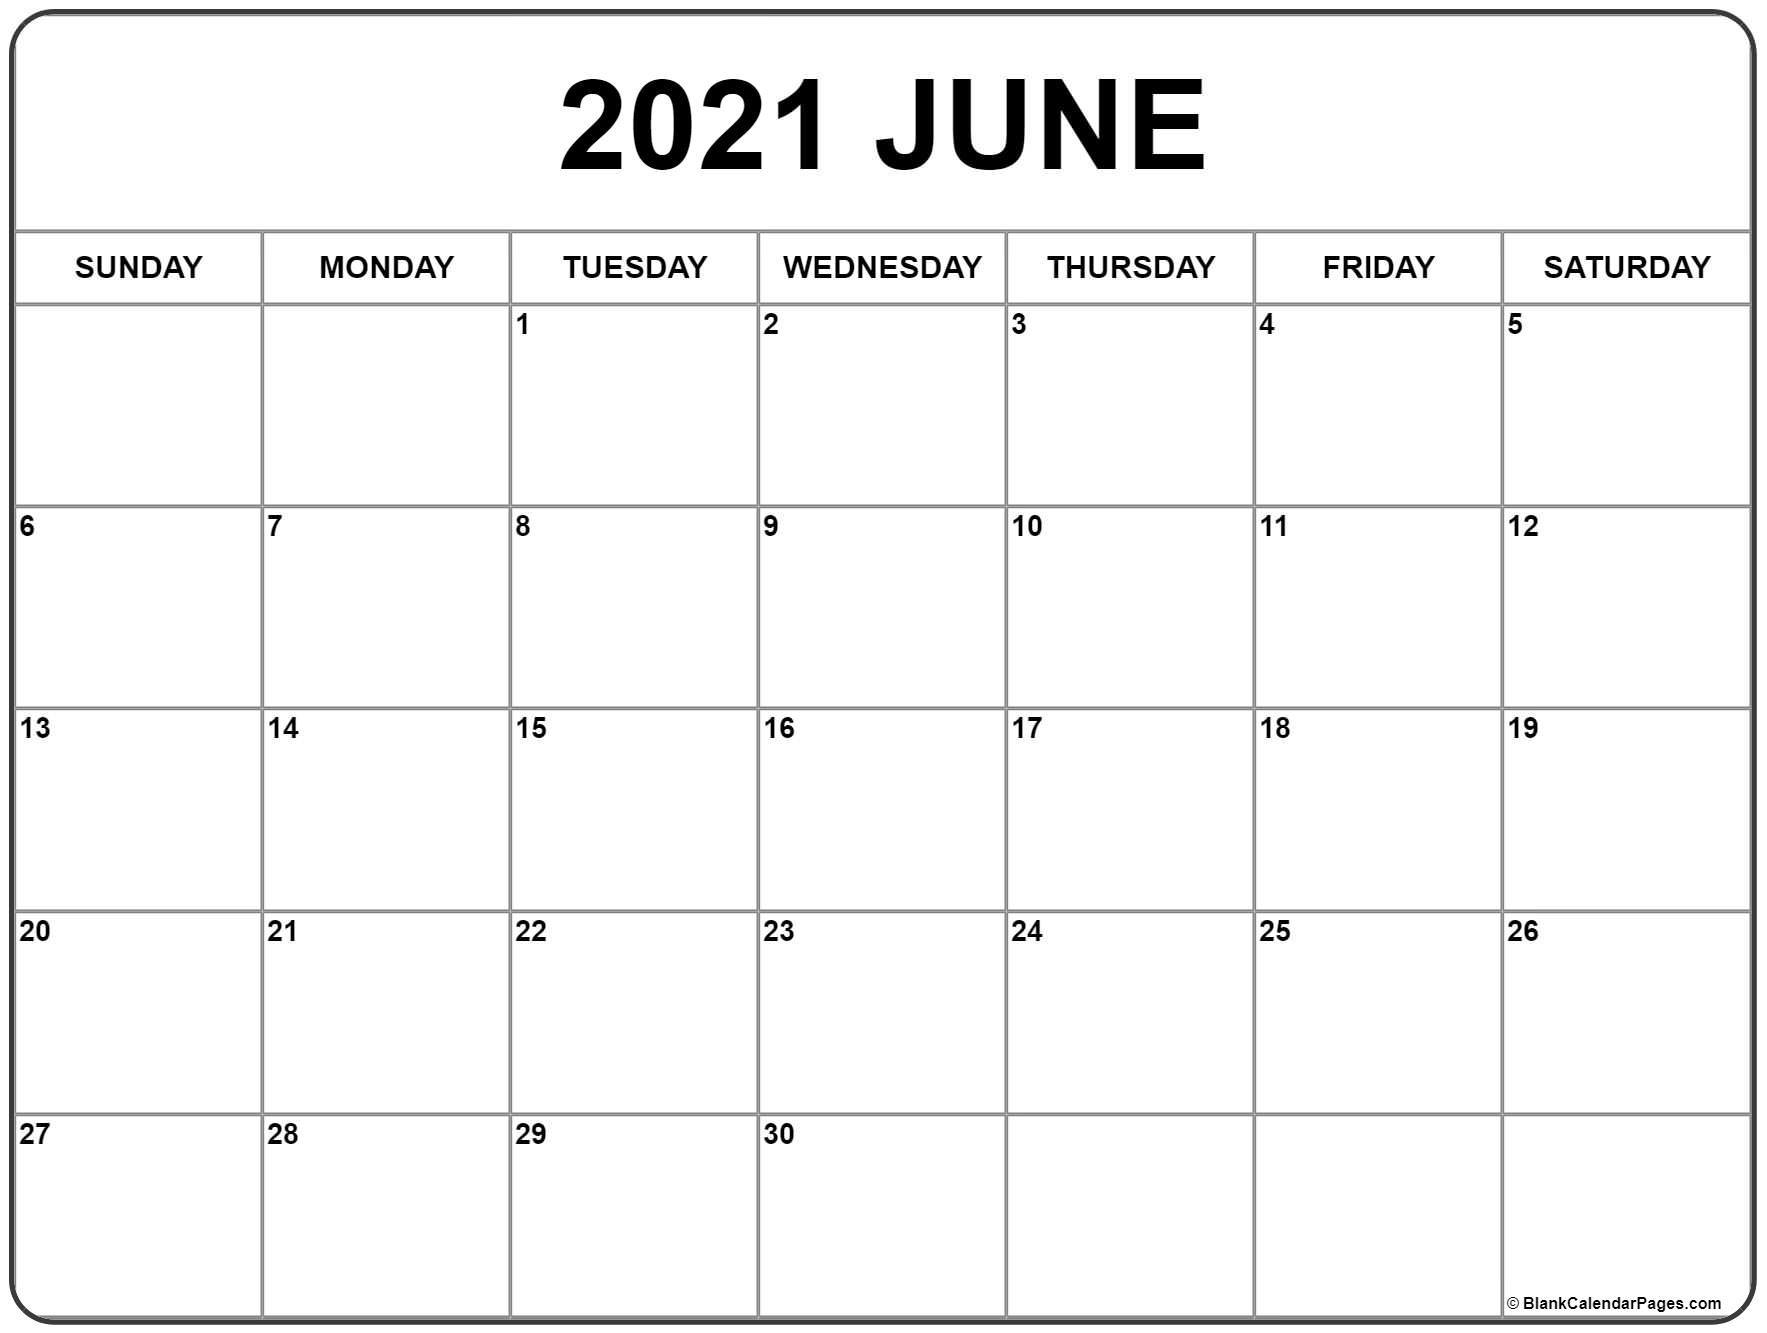 June 2021 Calendar | Free Printable Monthly Calendars  Free Monthly Calendar Template 2021